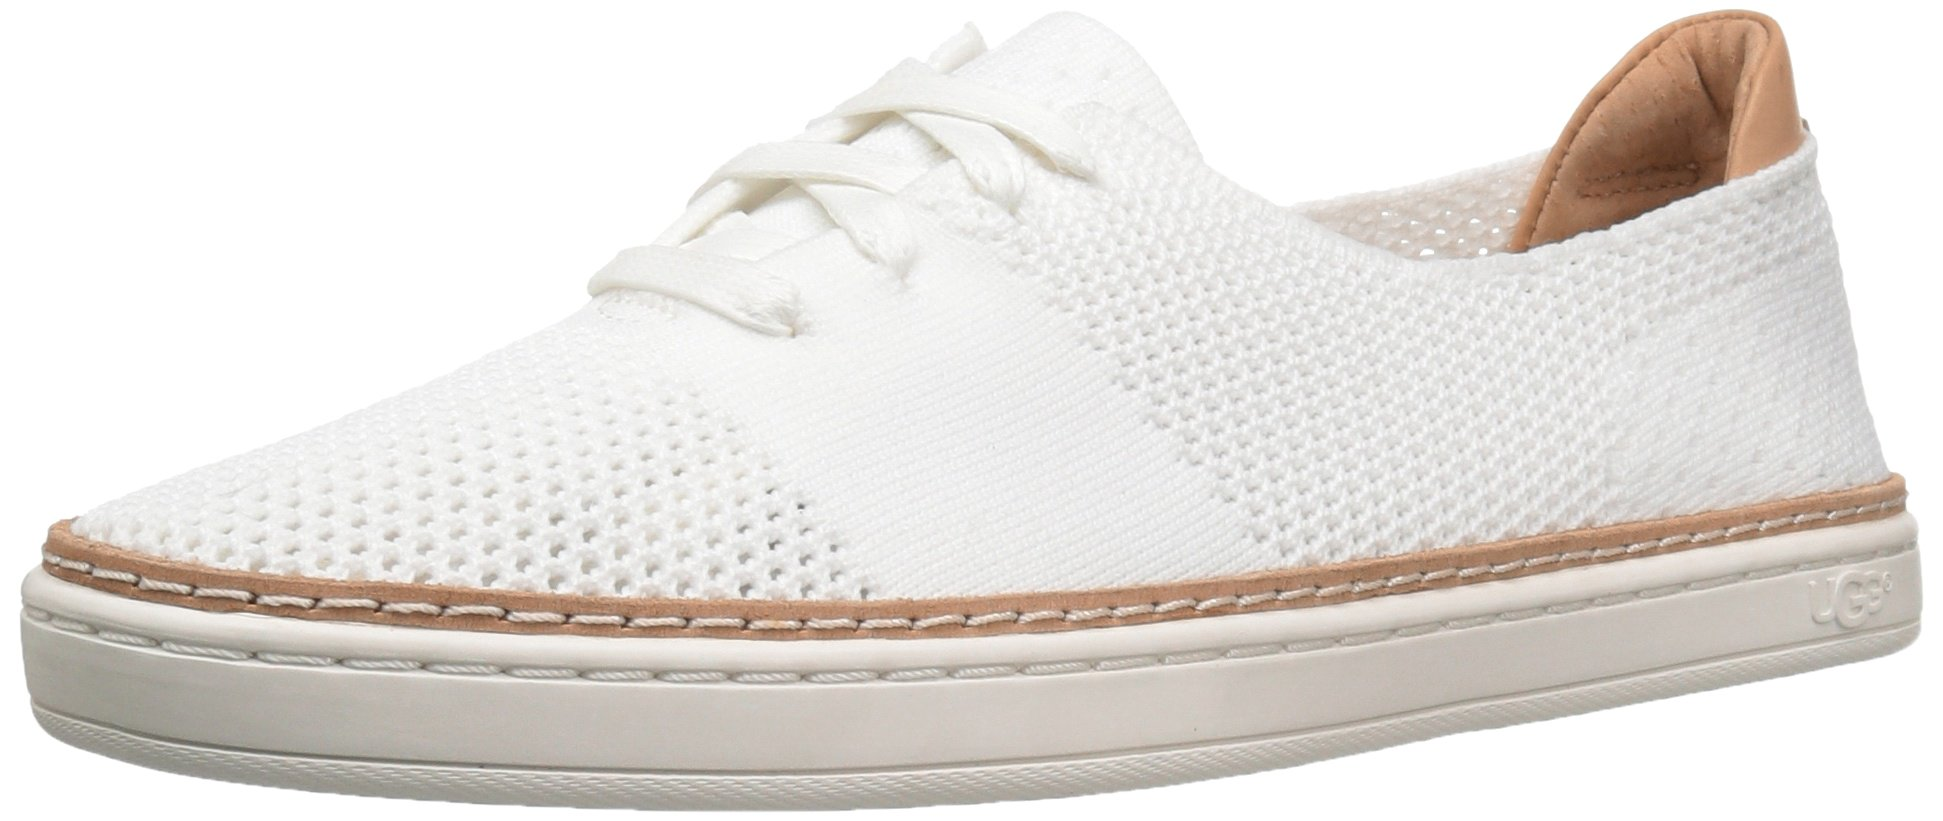 UGG Women's Pinkett Fashion Sneaker, White, 5 US/5 B US